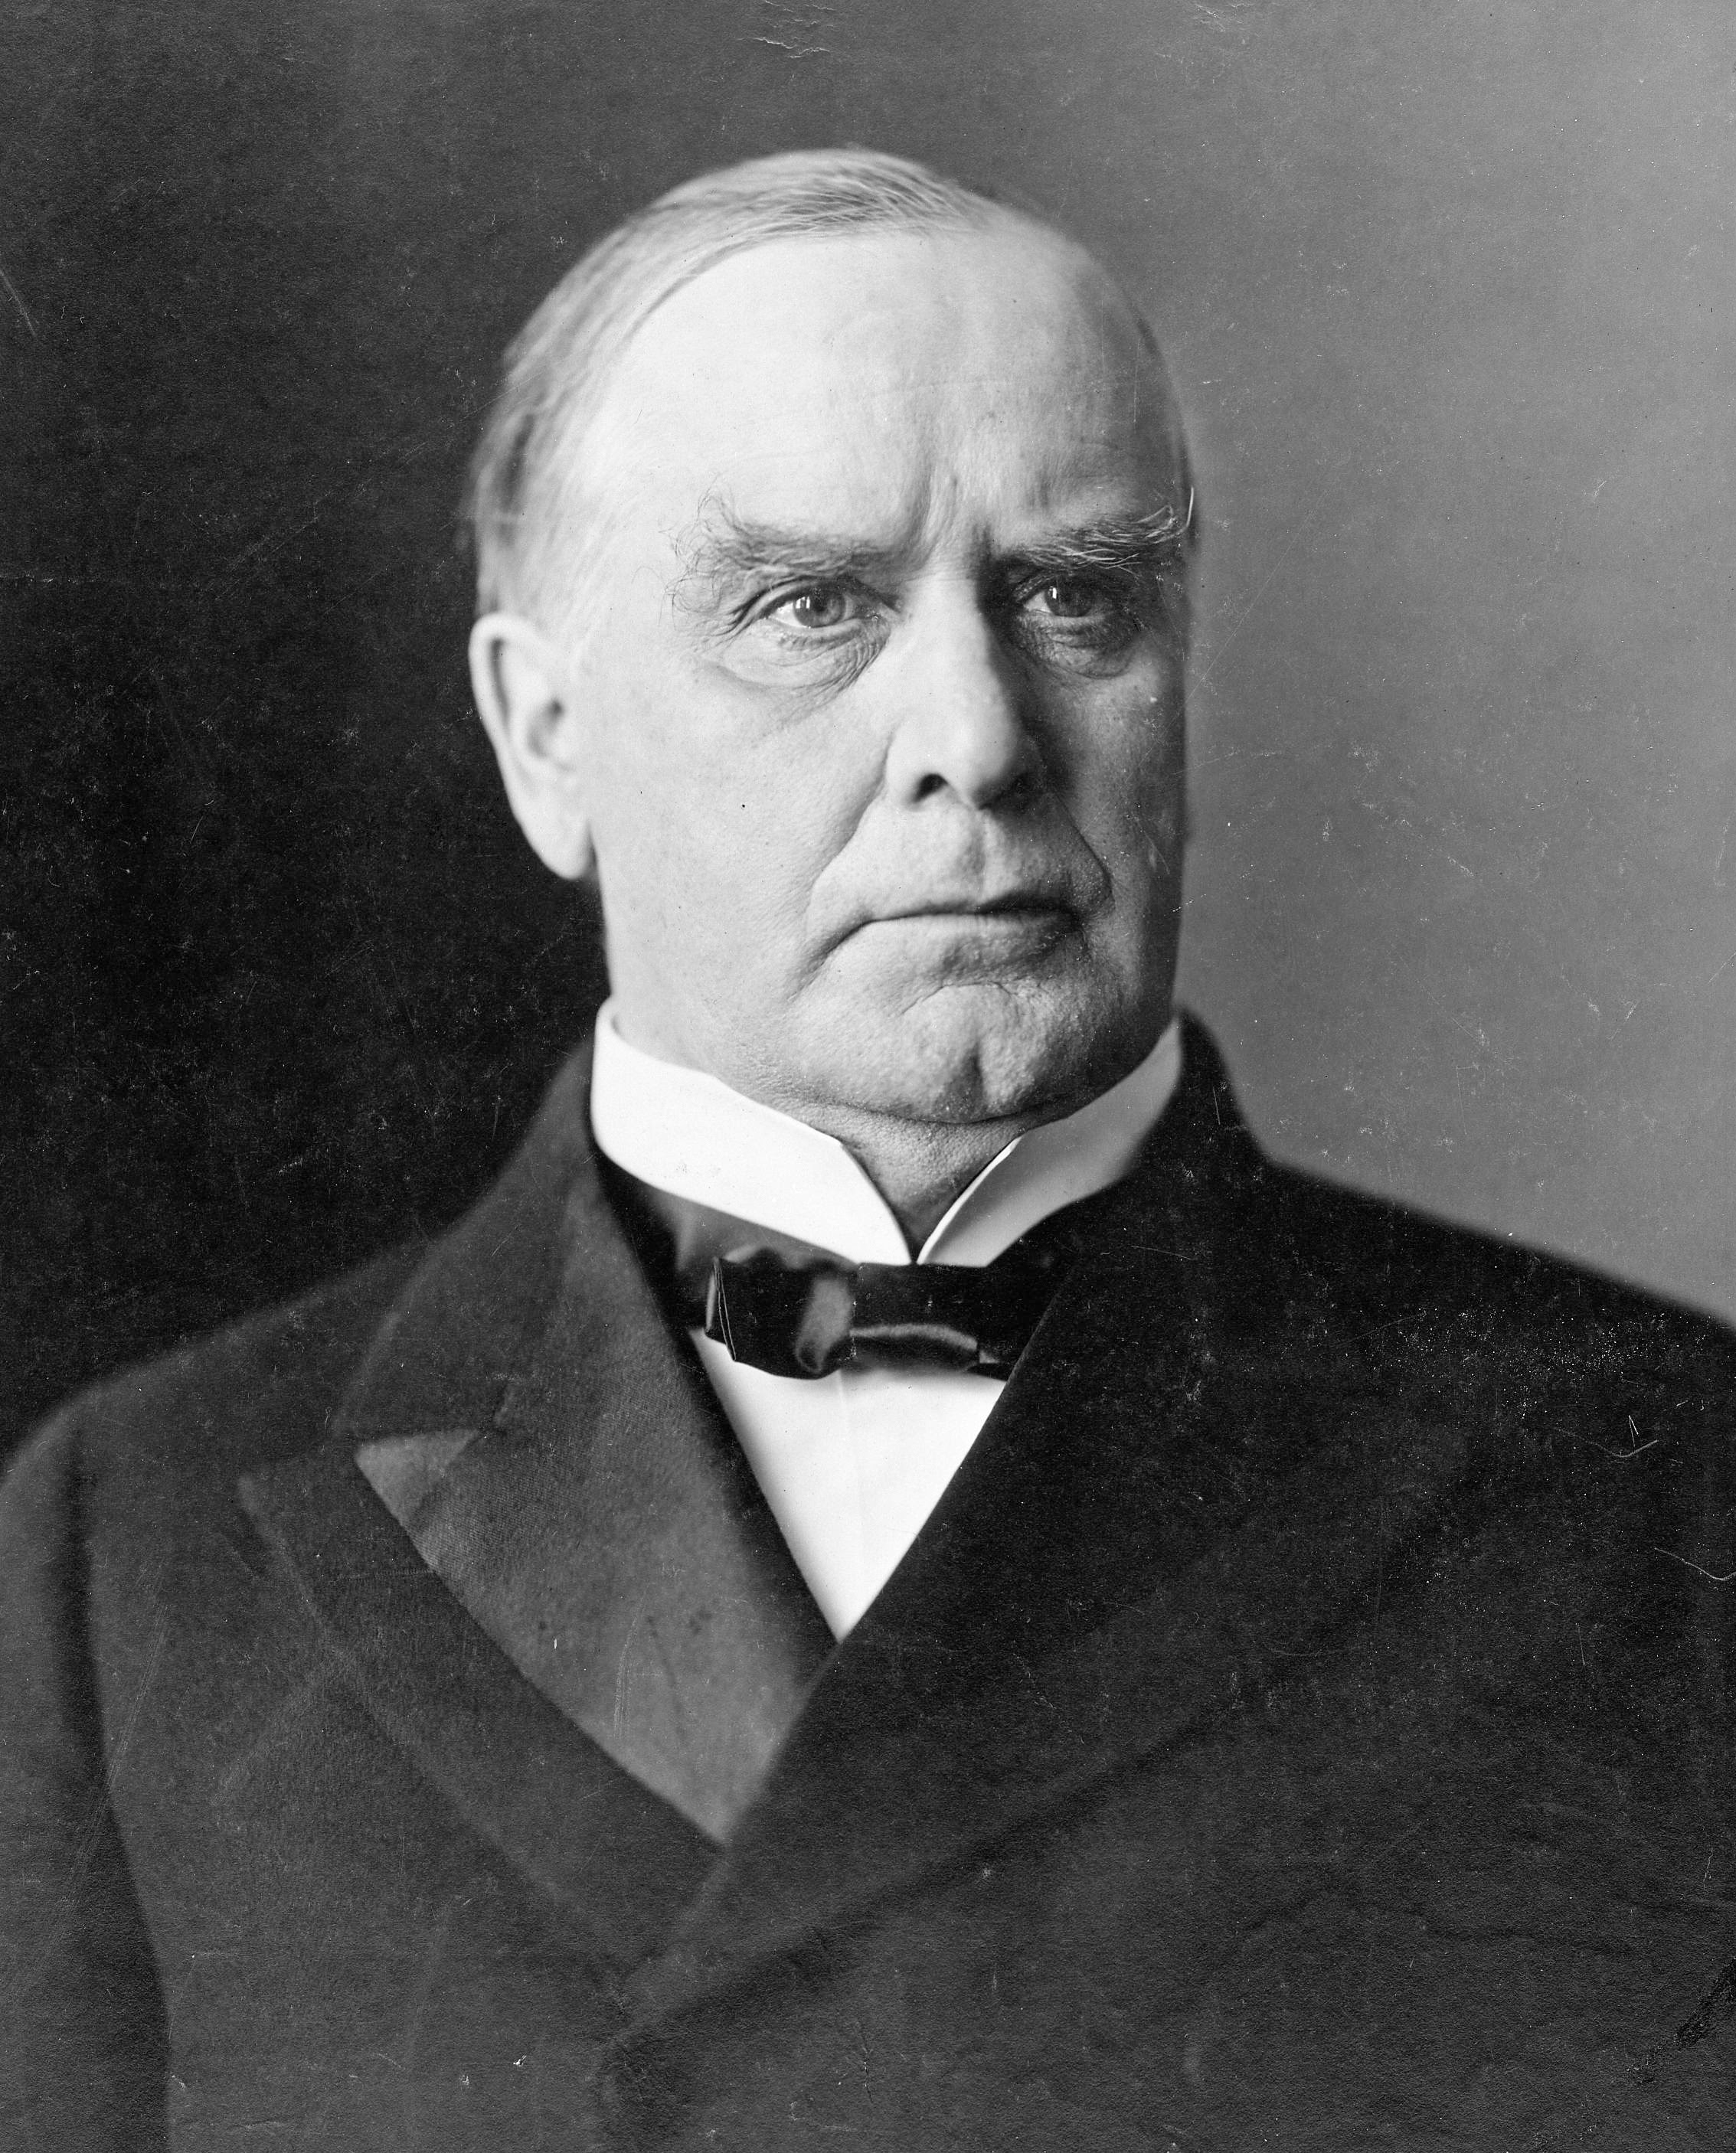 President William McKinley of those United States